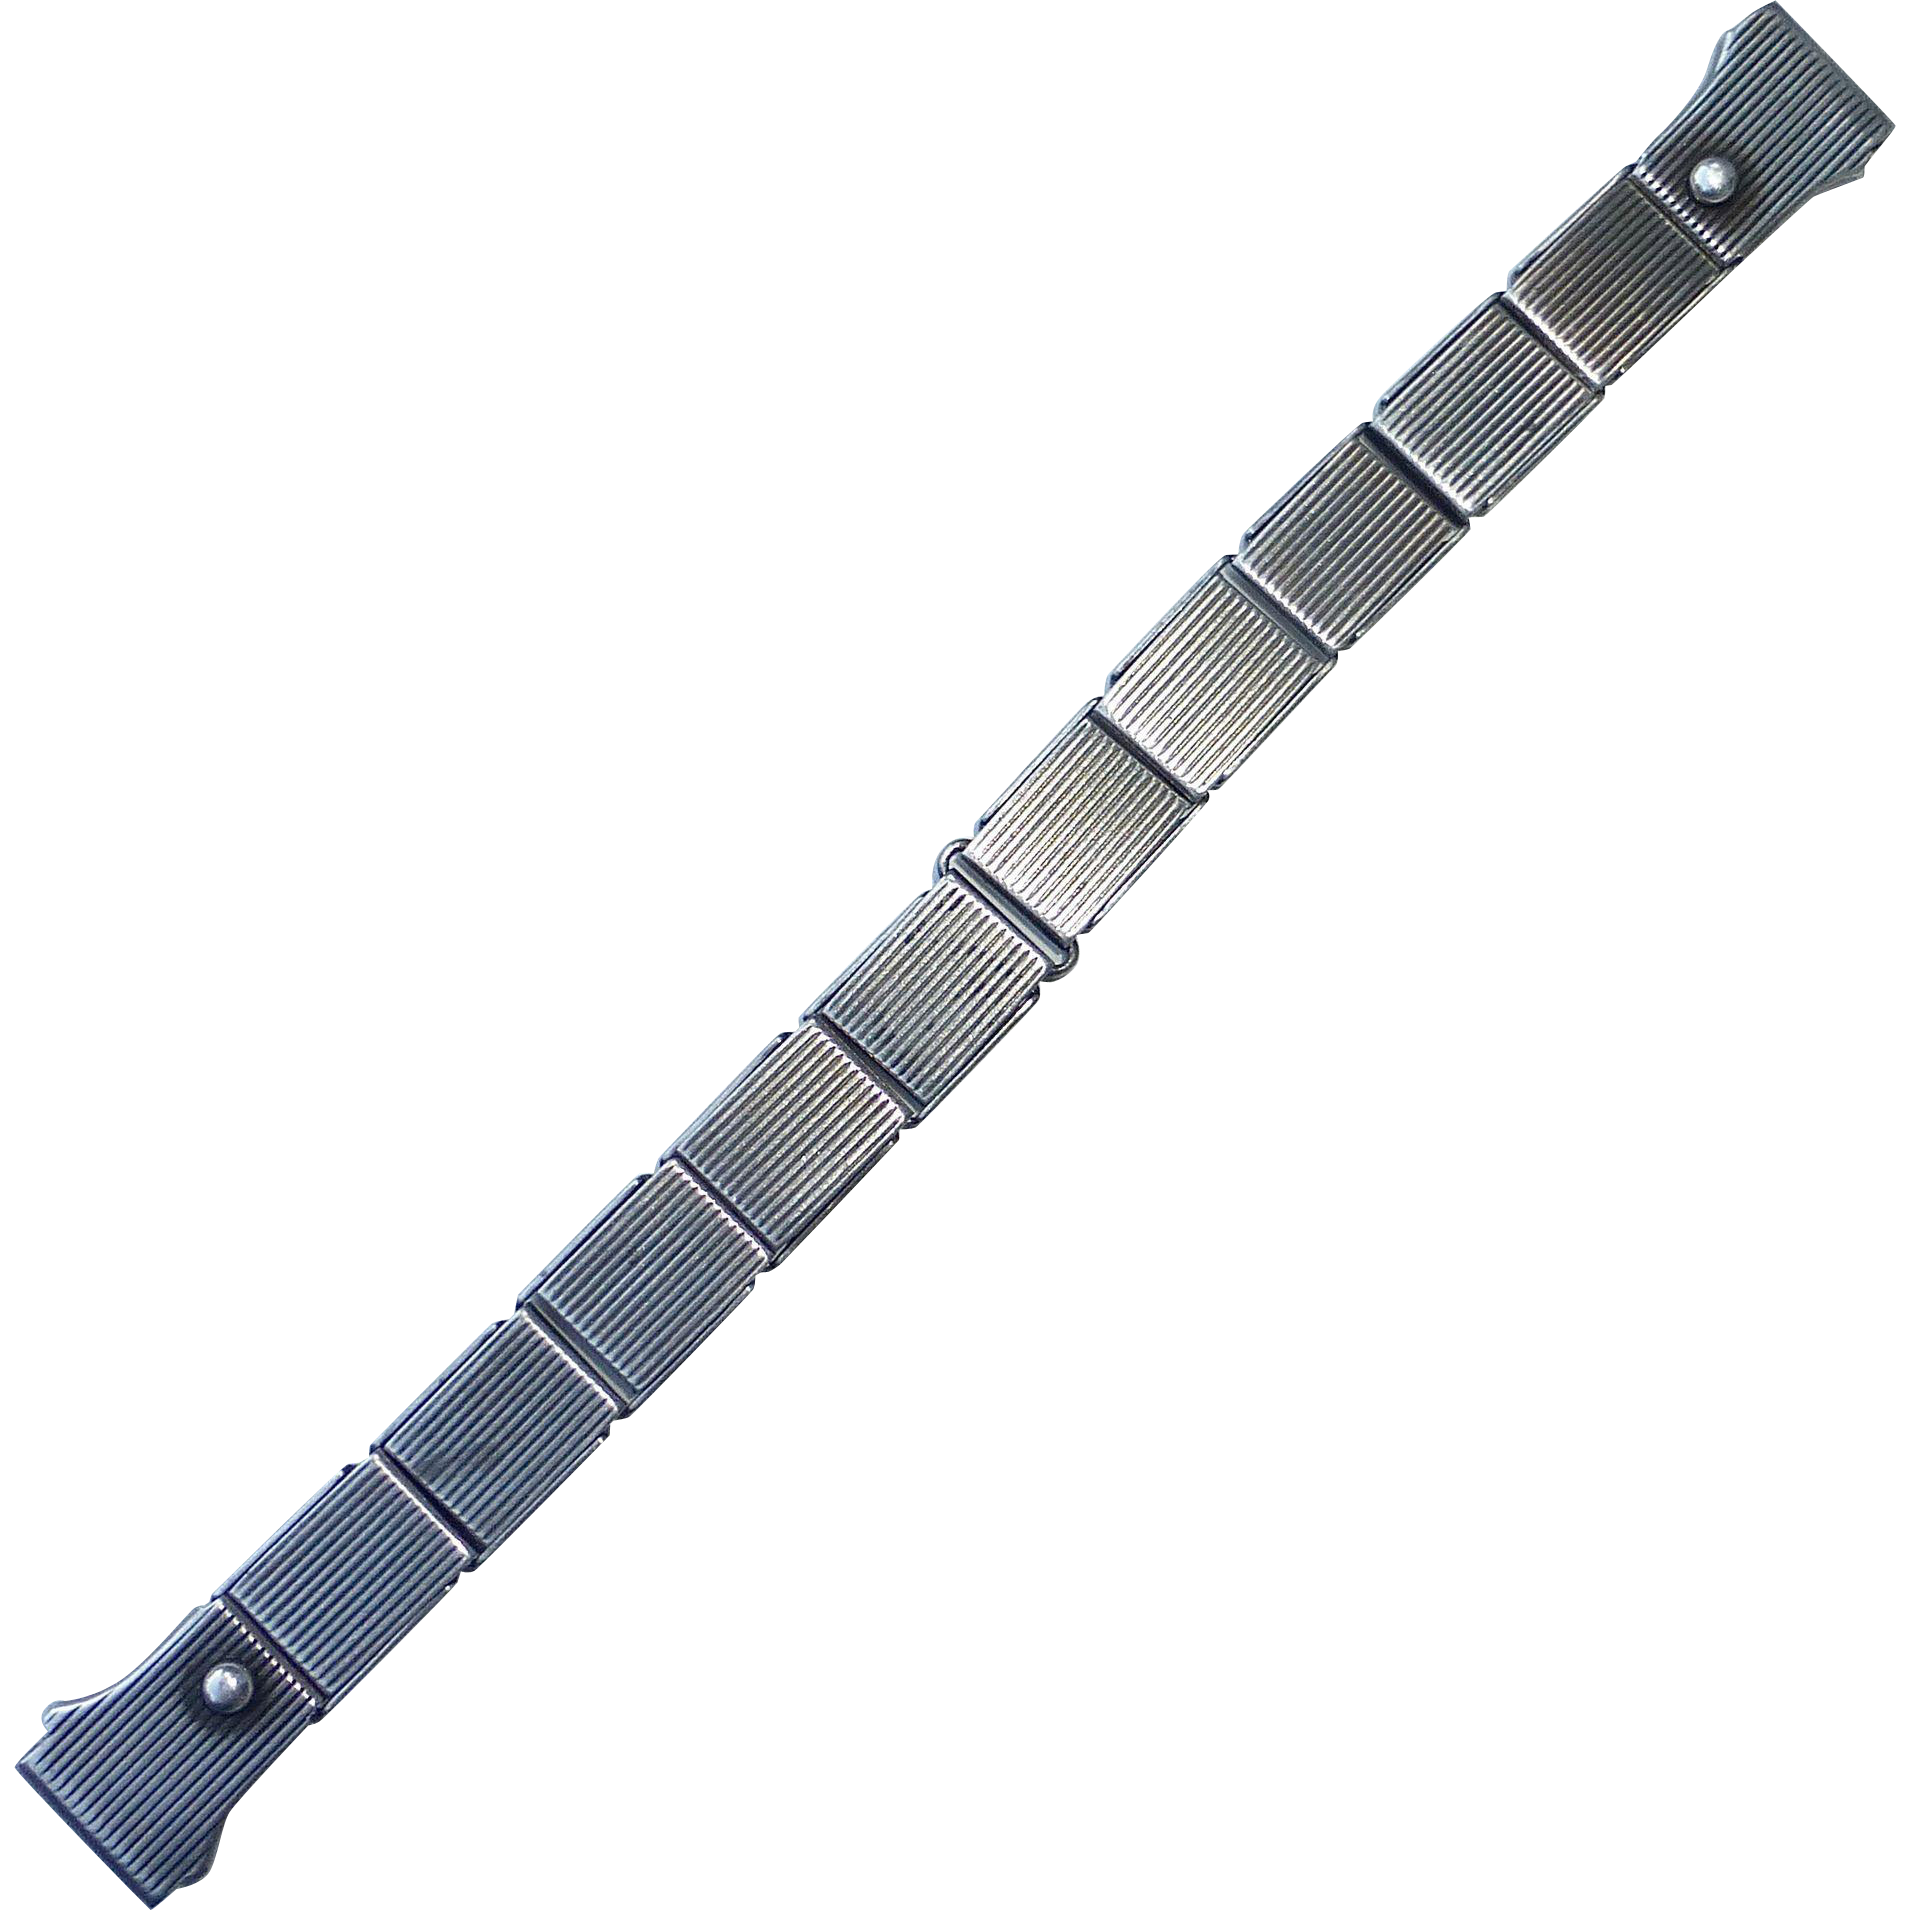 Sterling Watchband w Spring Expanding Link Design